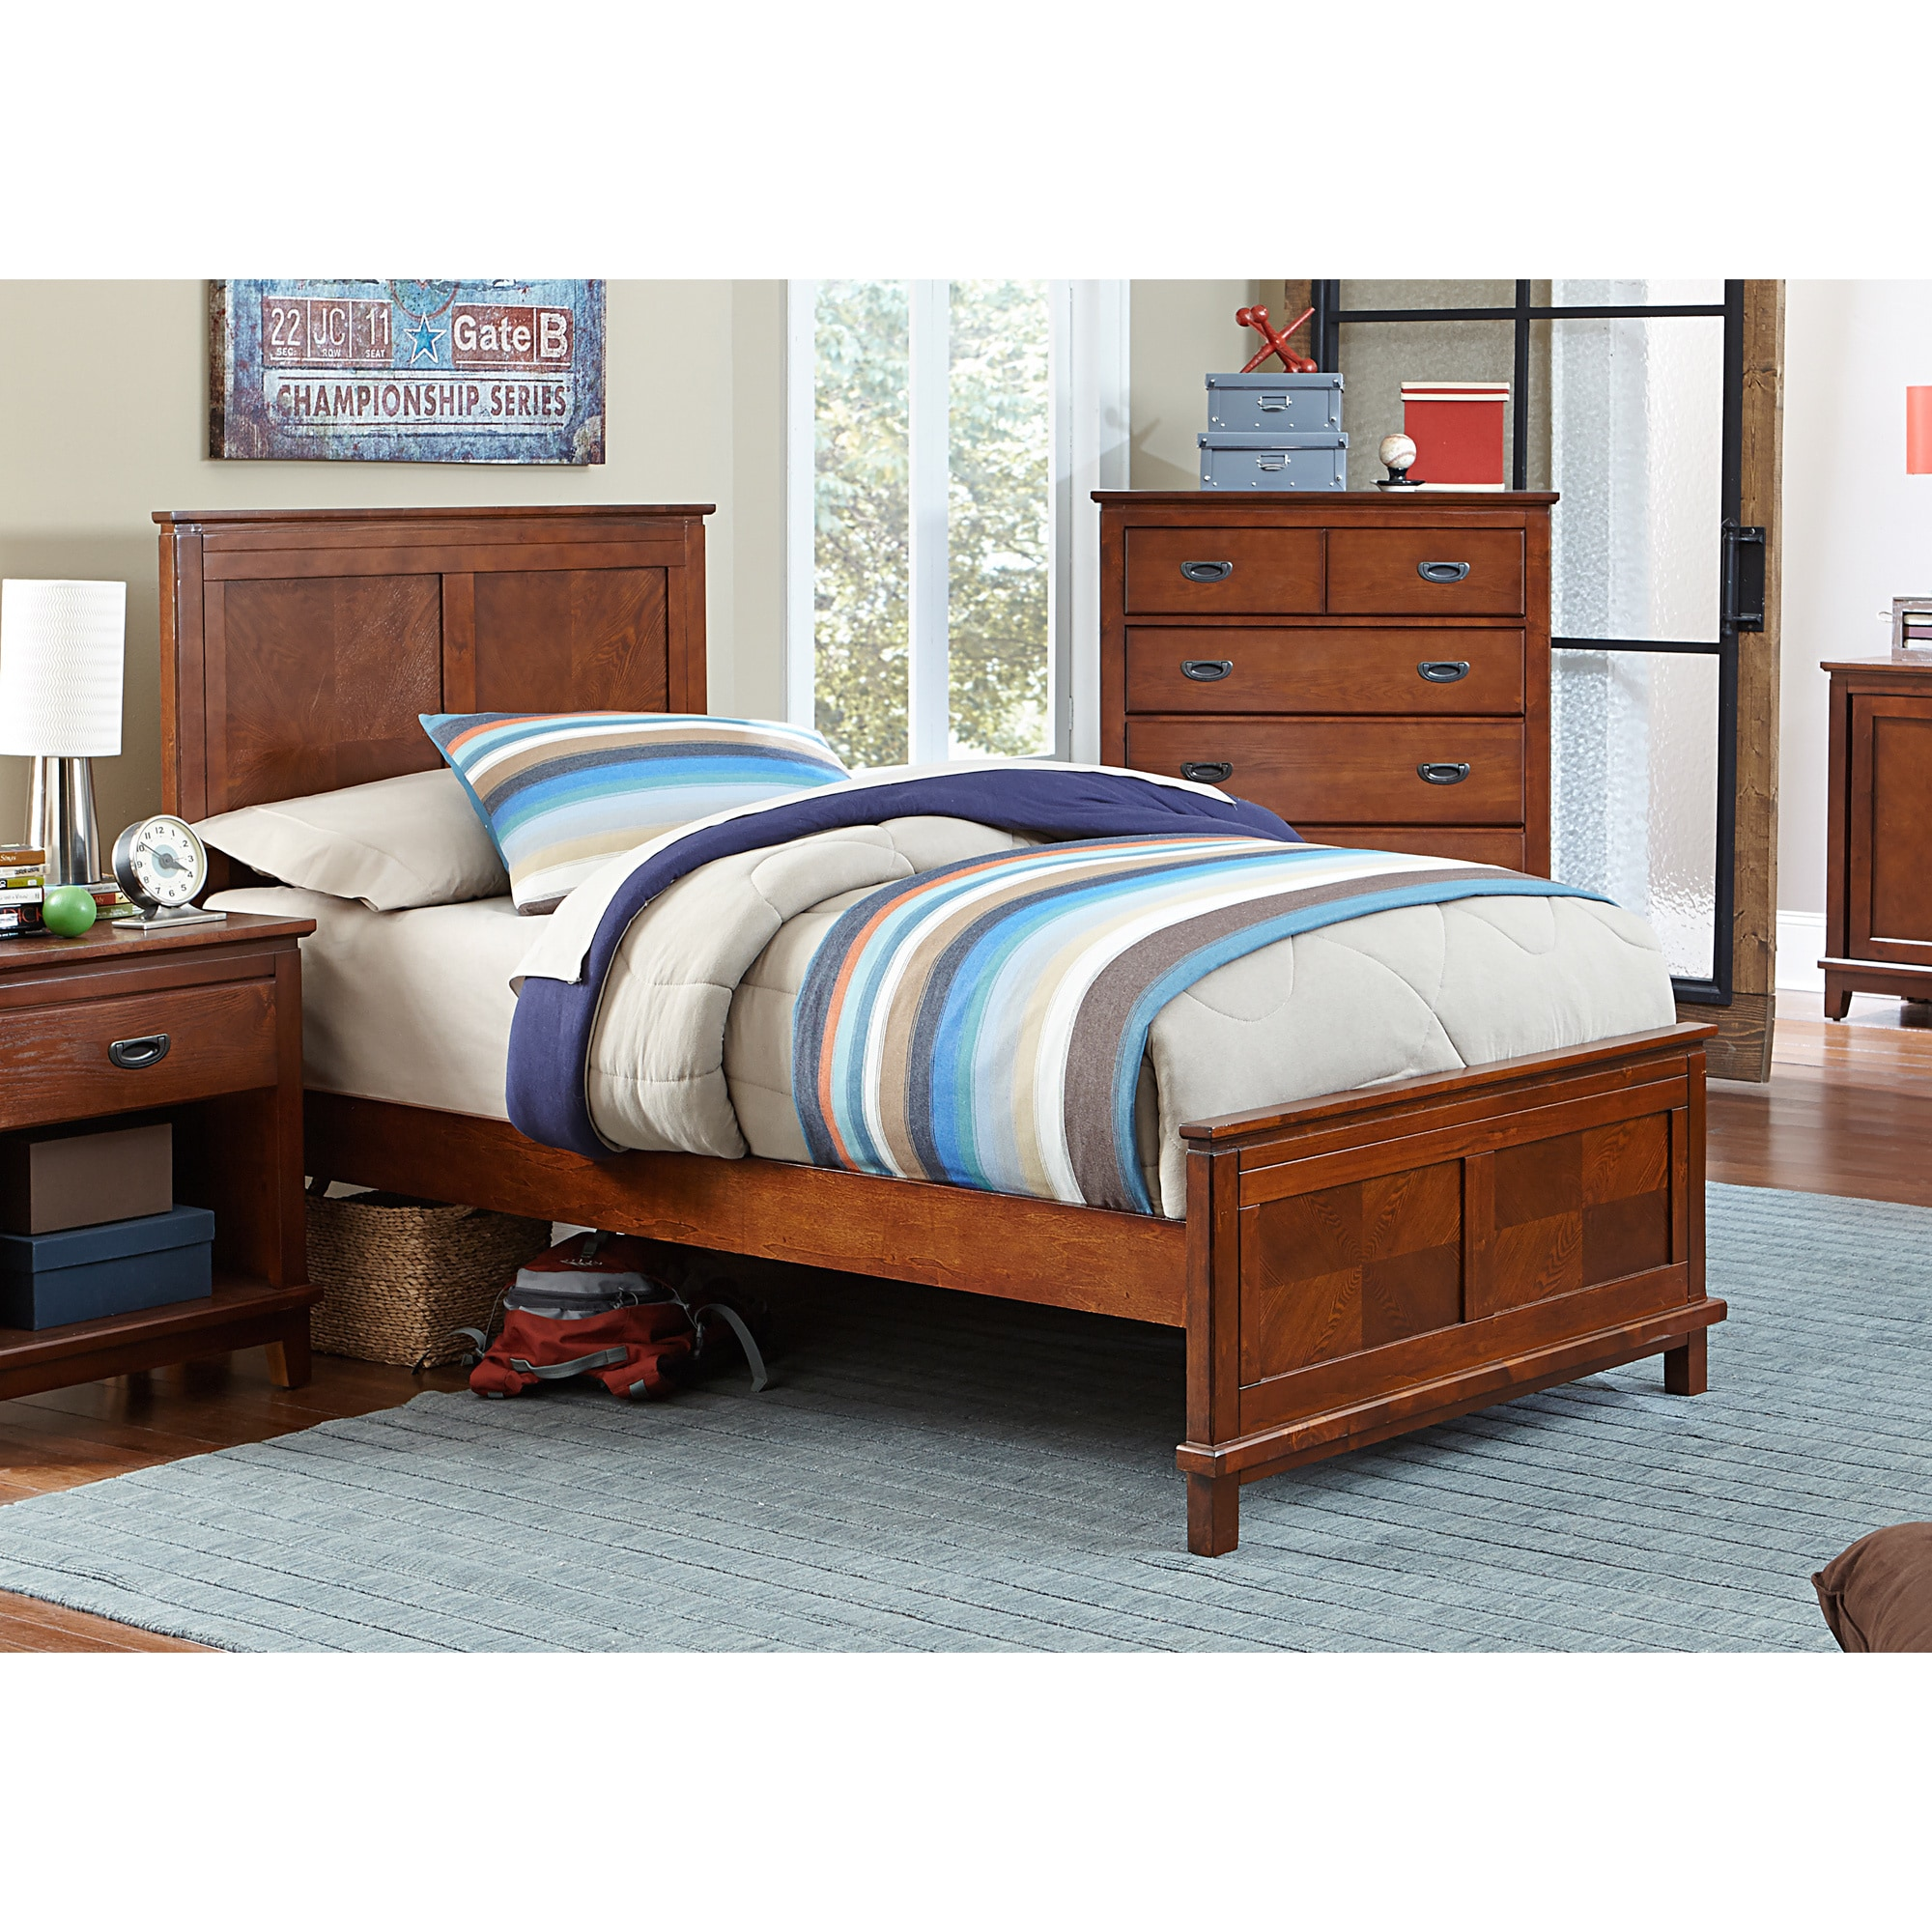 Image of: Shop Hillsdale Bailey Mission Oak Panel Bed Overstock 9893664